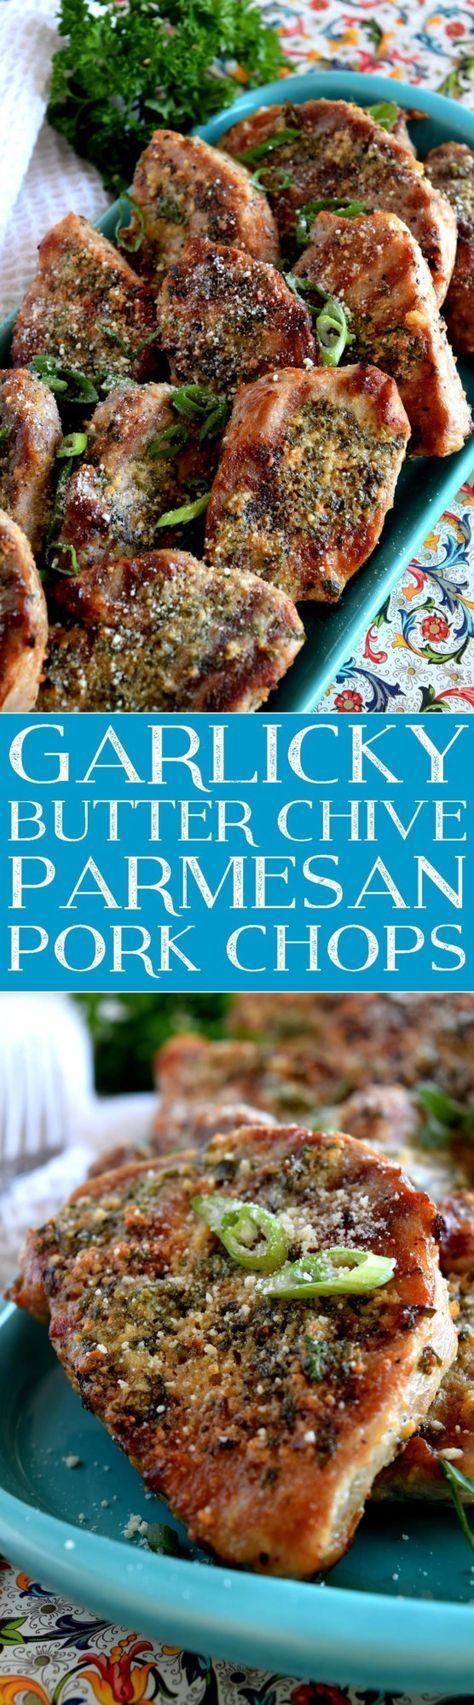 Garlicky Butter Chive Parmesan Pork Chops - Lord Byron's Kitchen